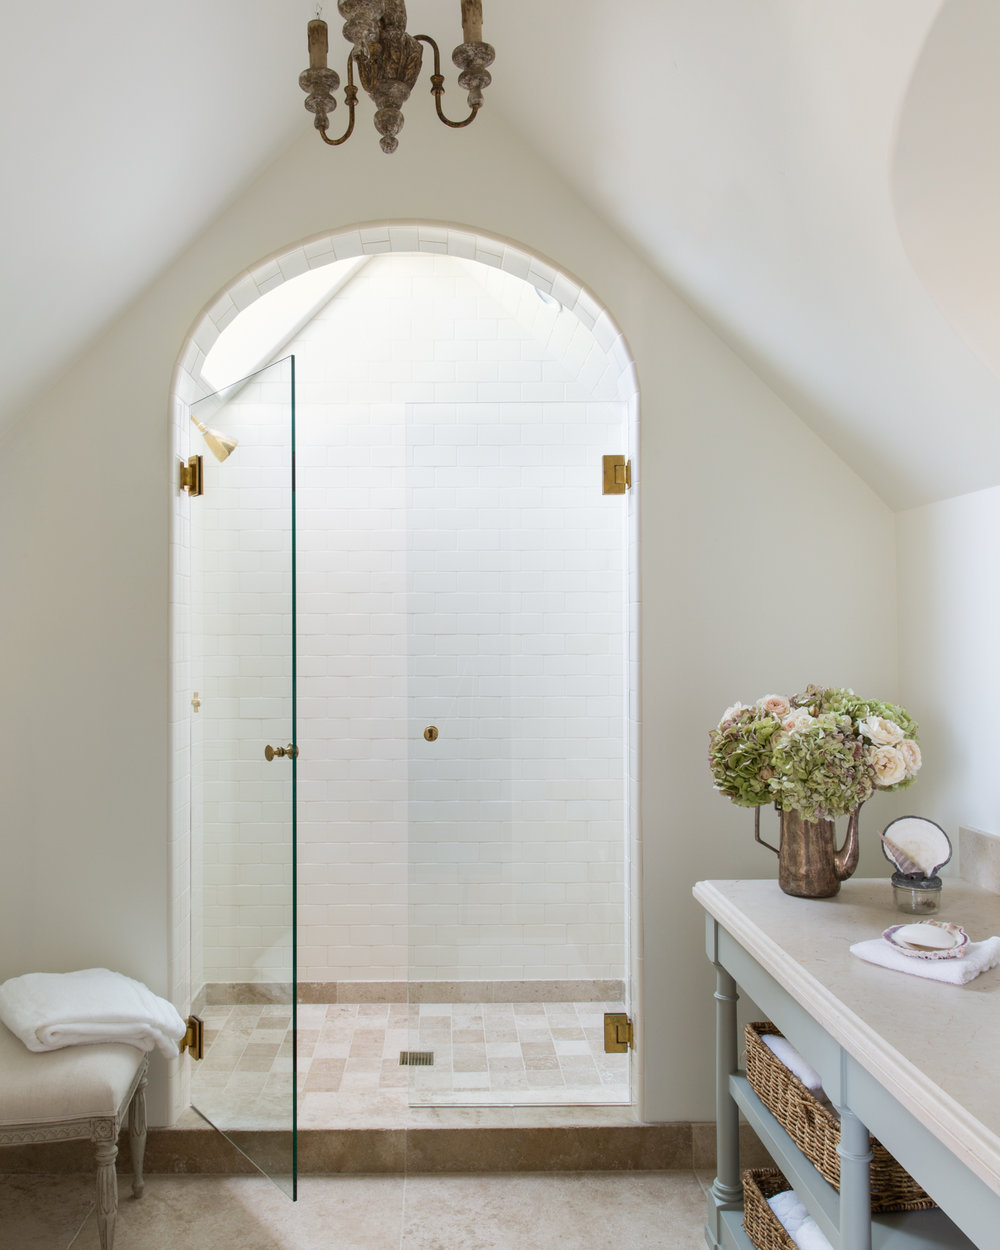 Romantic French farmhouse style bathroom - found on Hello Lovely Studio